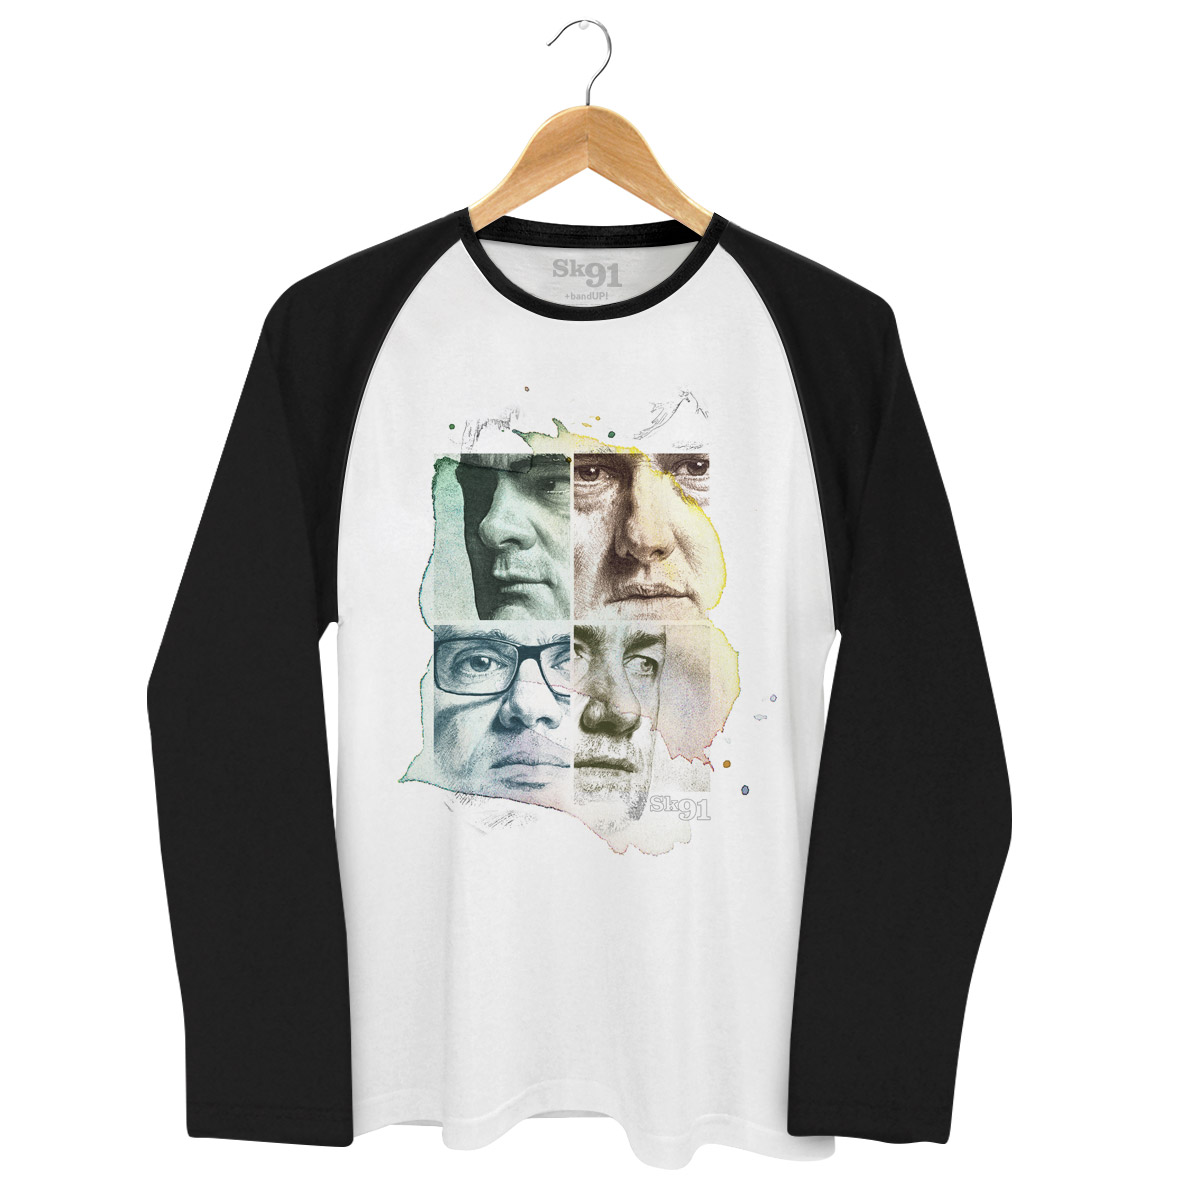 Camiseta Raglan Masculina SK91 Capa